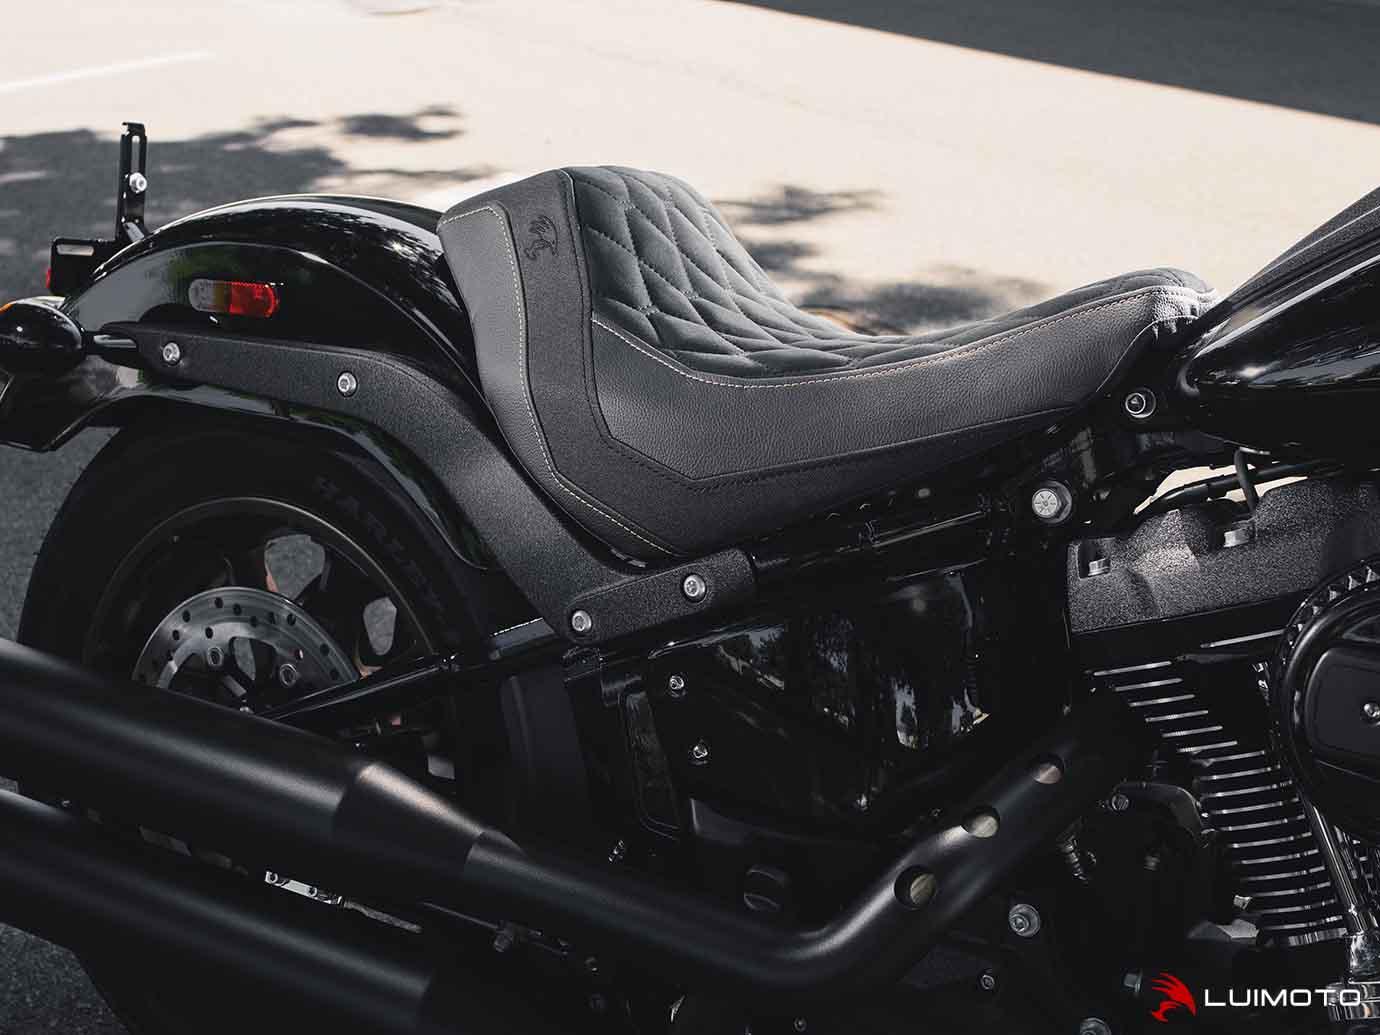 LUIMOTO (ルイモト) Hex-Diamond / フロントシート カバー Harley Davidson LOW RIDER S 16-20